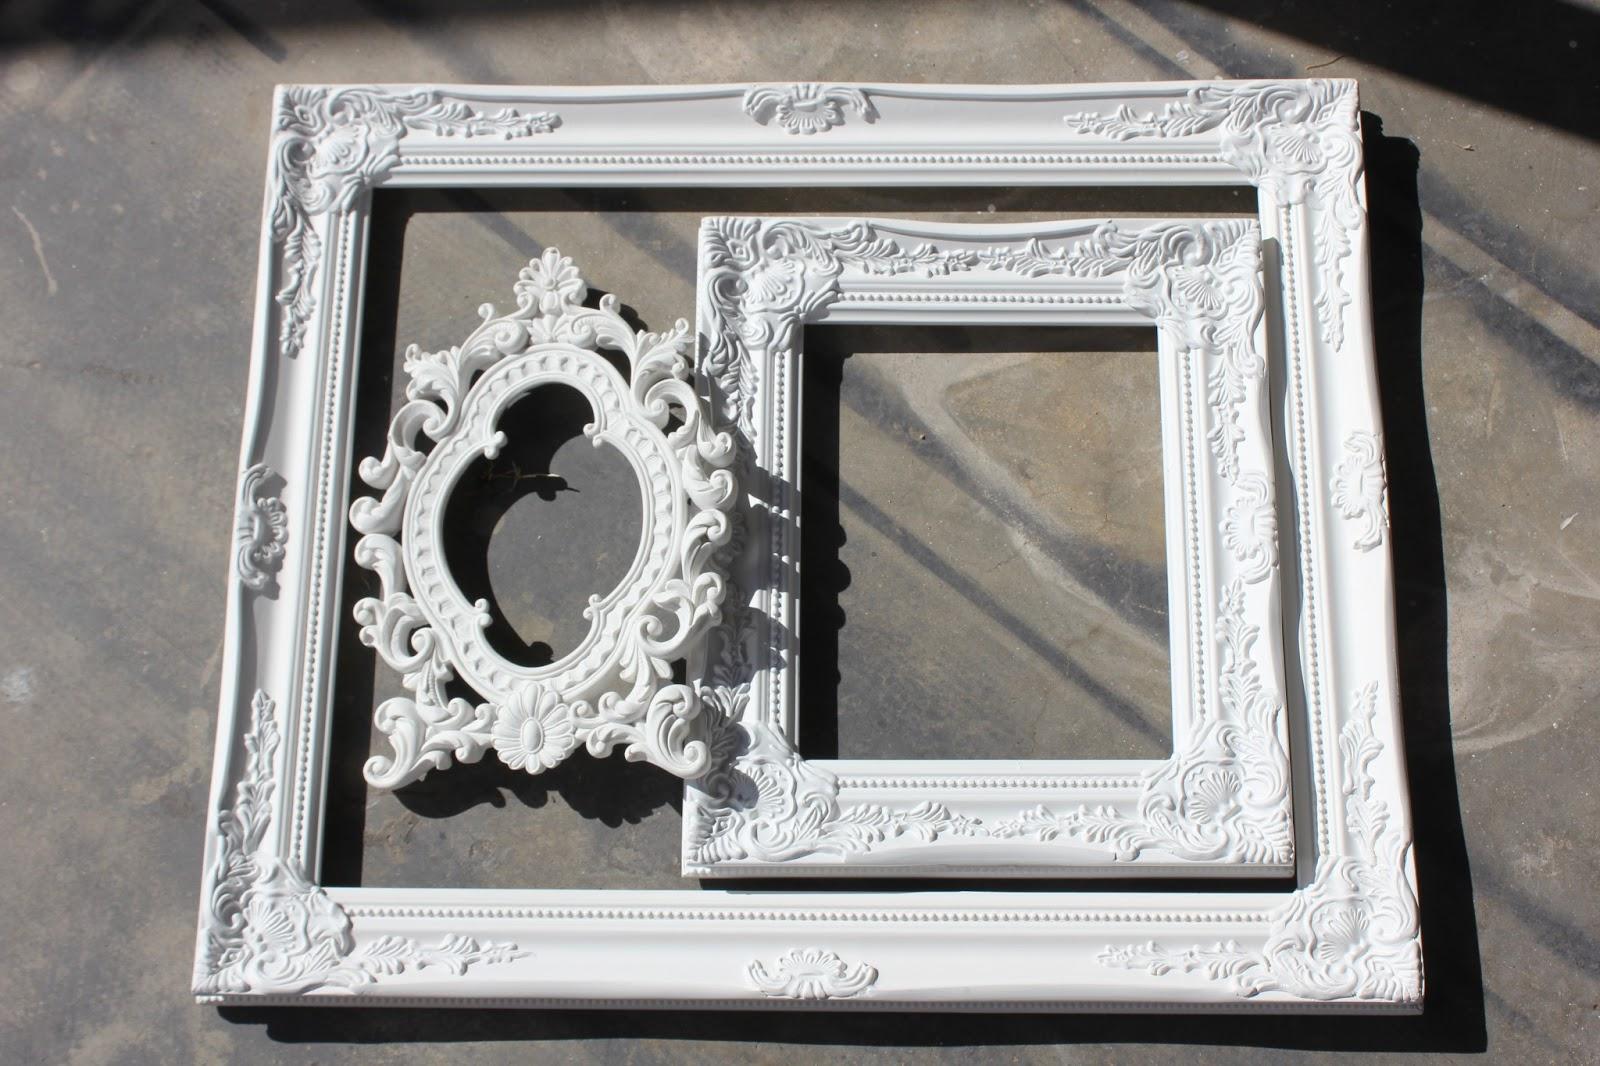 Hawks and honey: DIY Chalkboards {upcycled frames, cardboard & spray ...